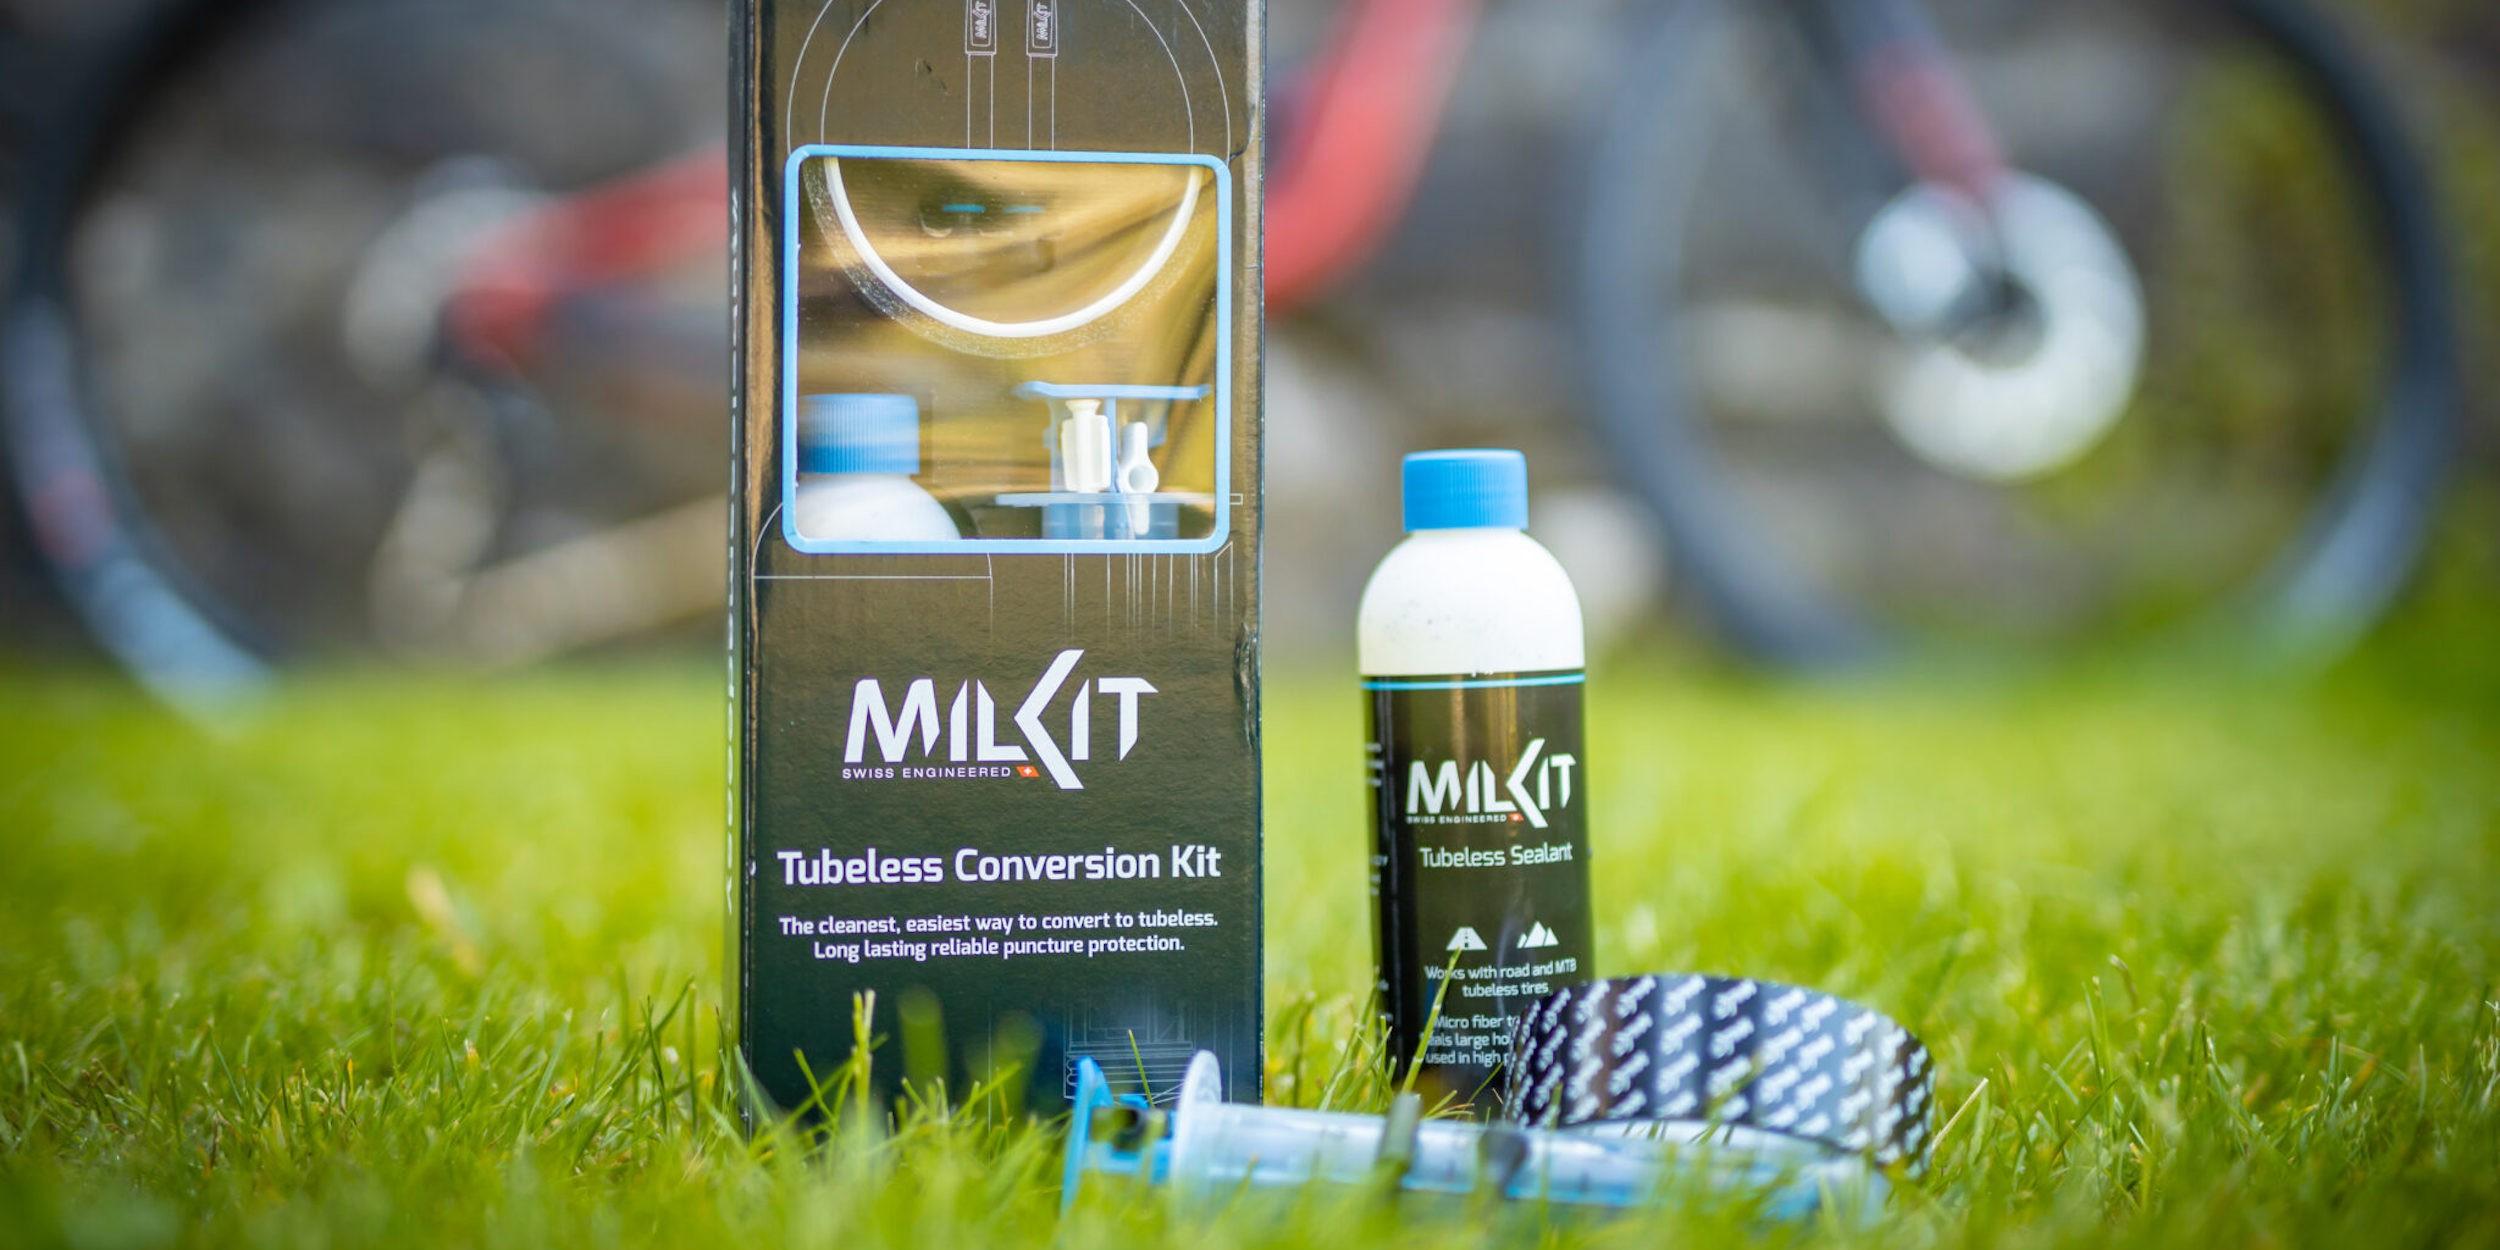 Milkit Felgenband und Tubeless Conversion Kit